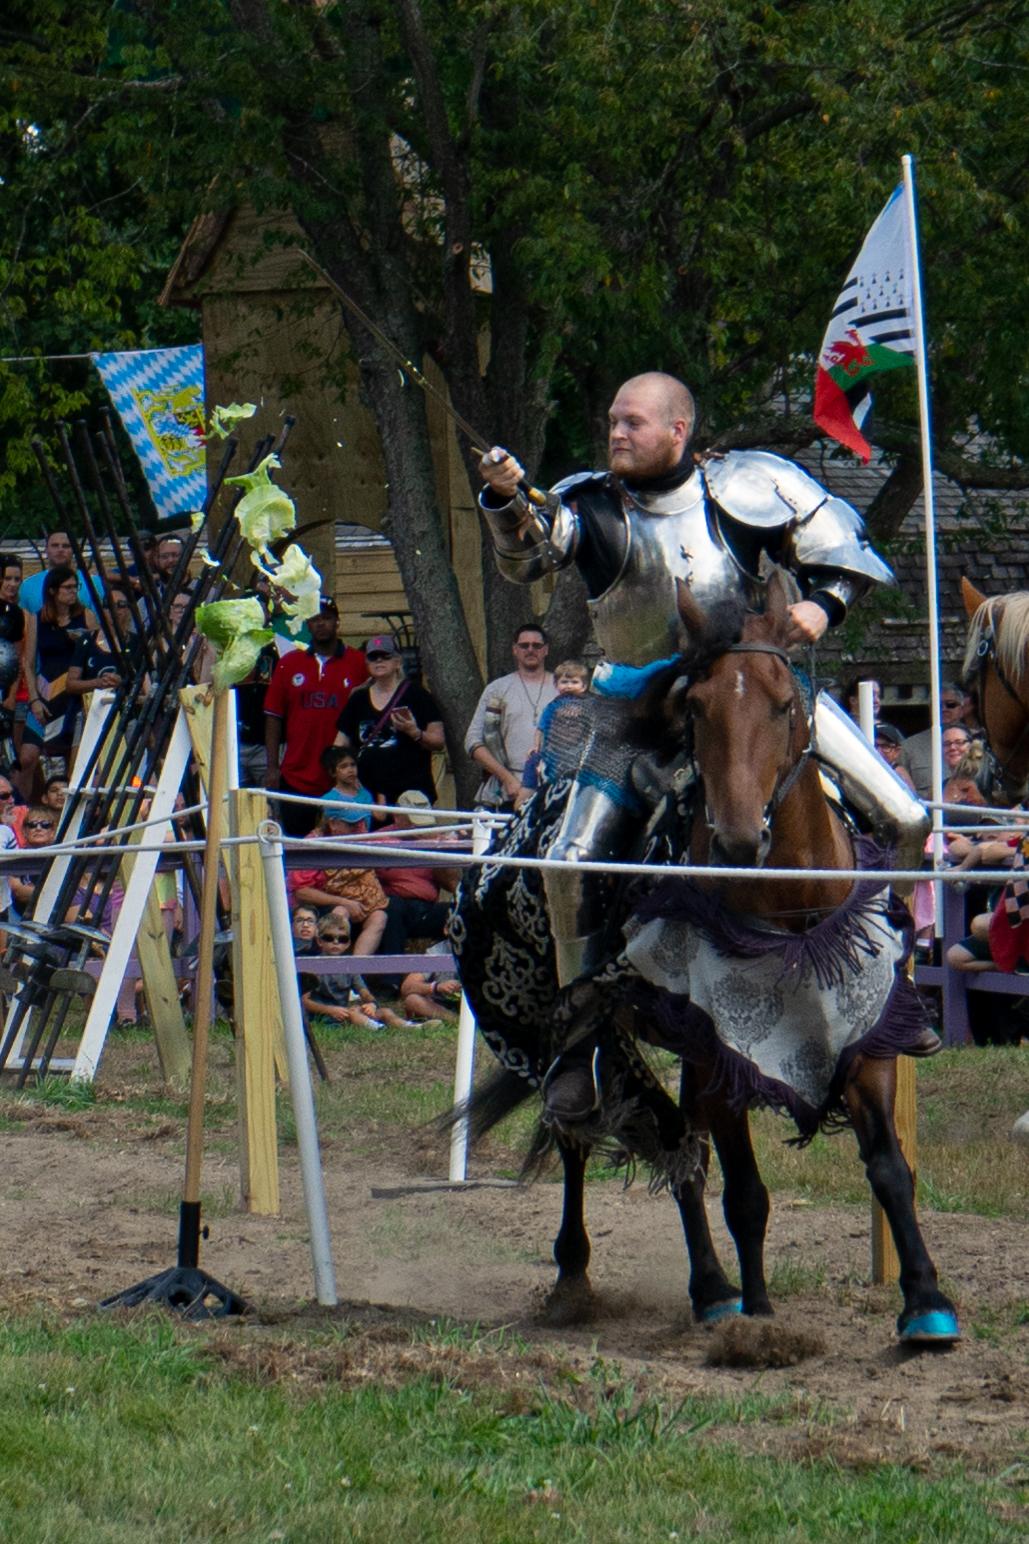 A knight at the Holly Renaissance Festival